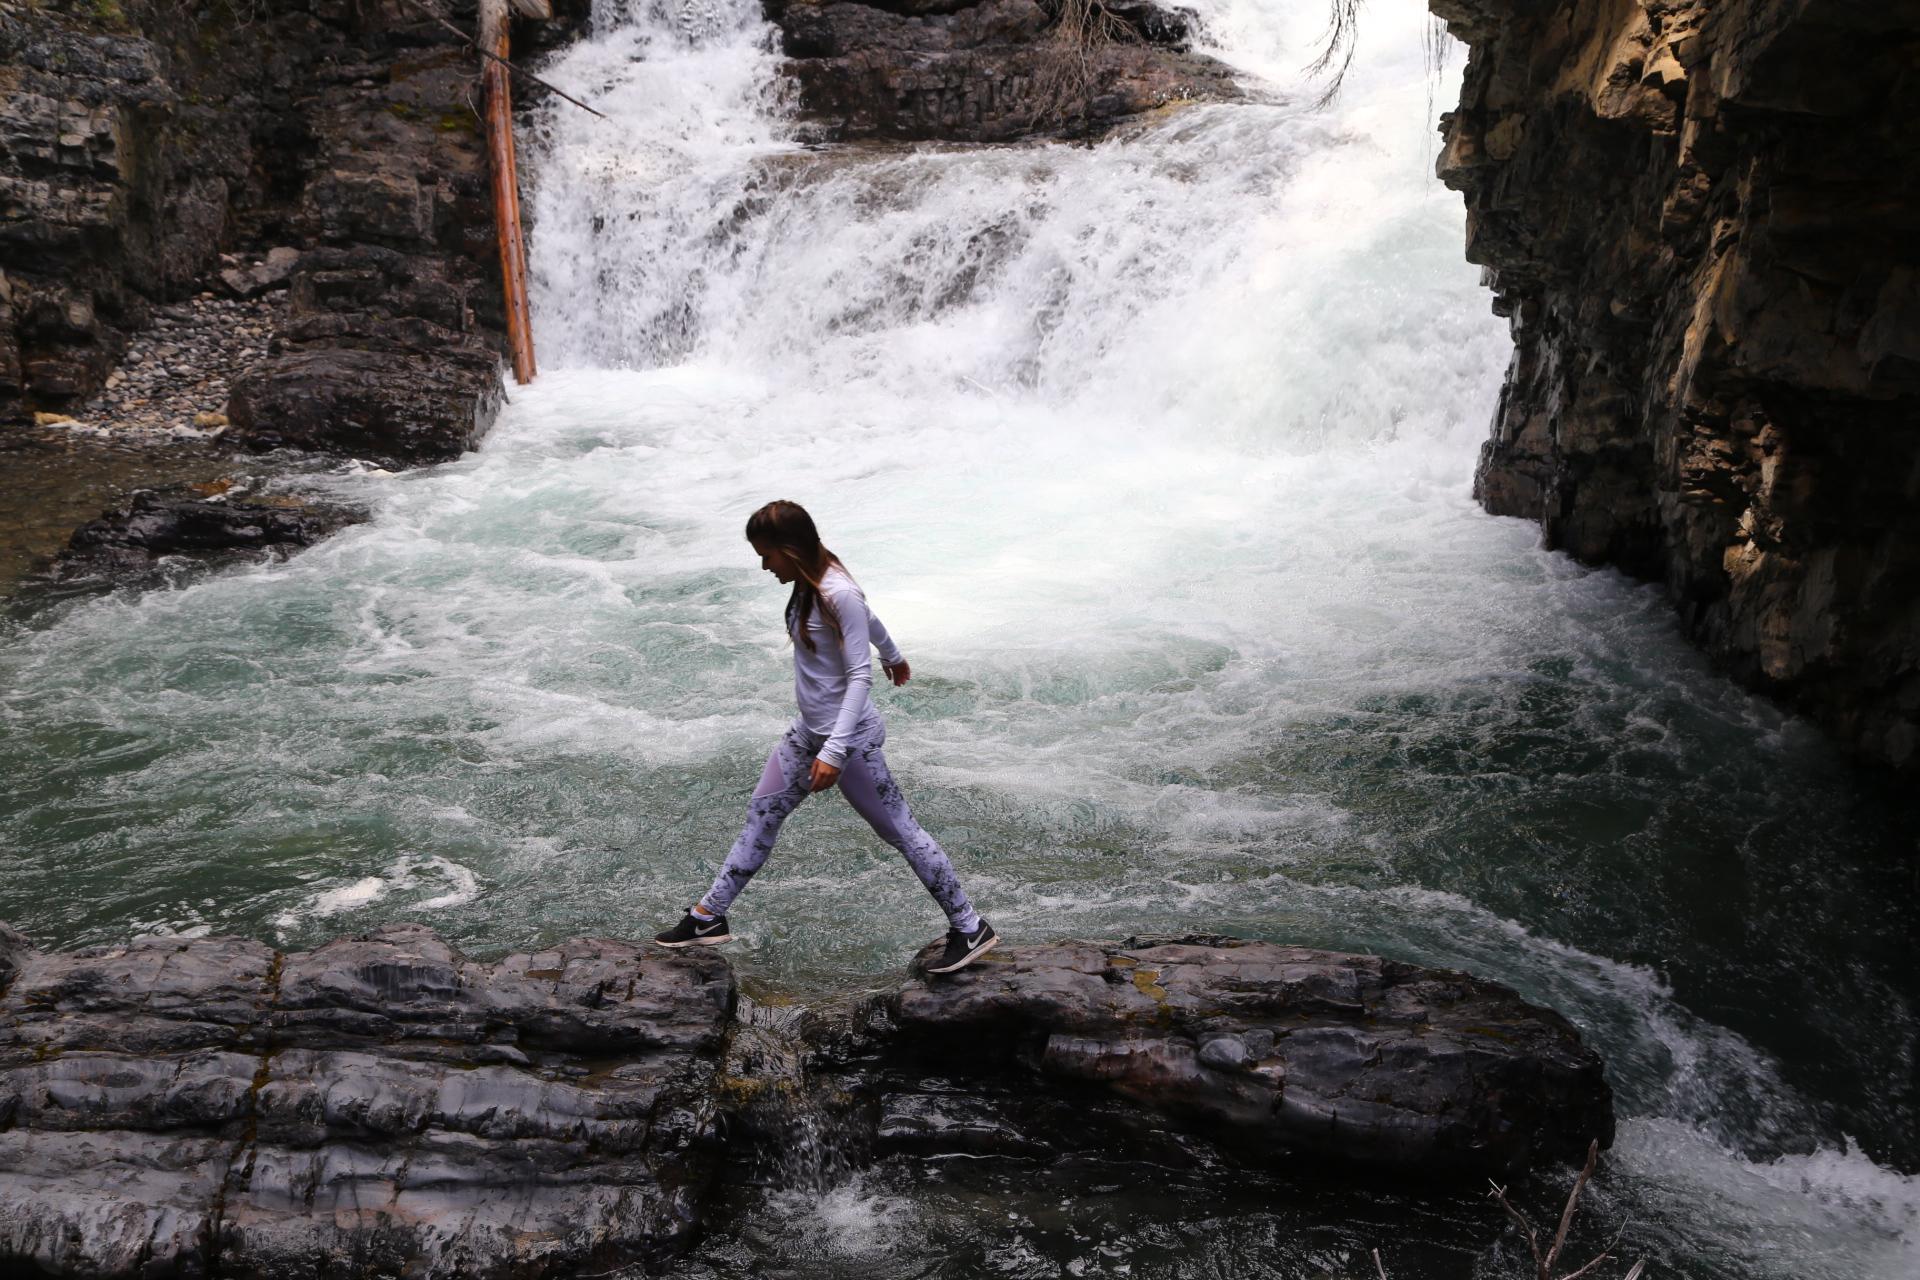 Erie Nick Lake Louise City Guide: Johnston Canyon Hike